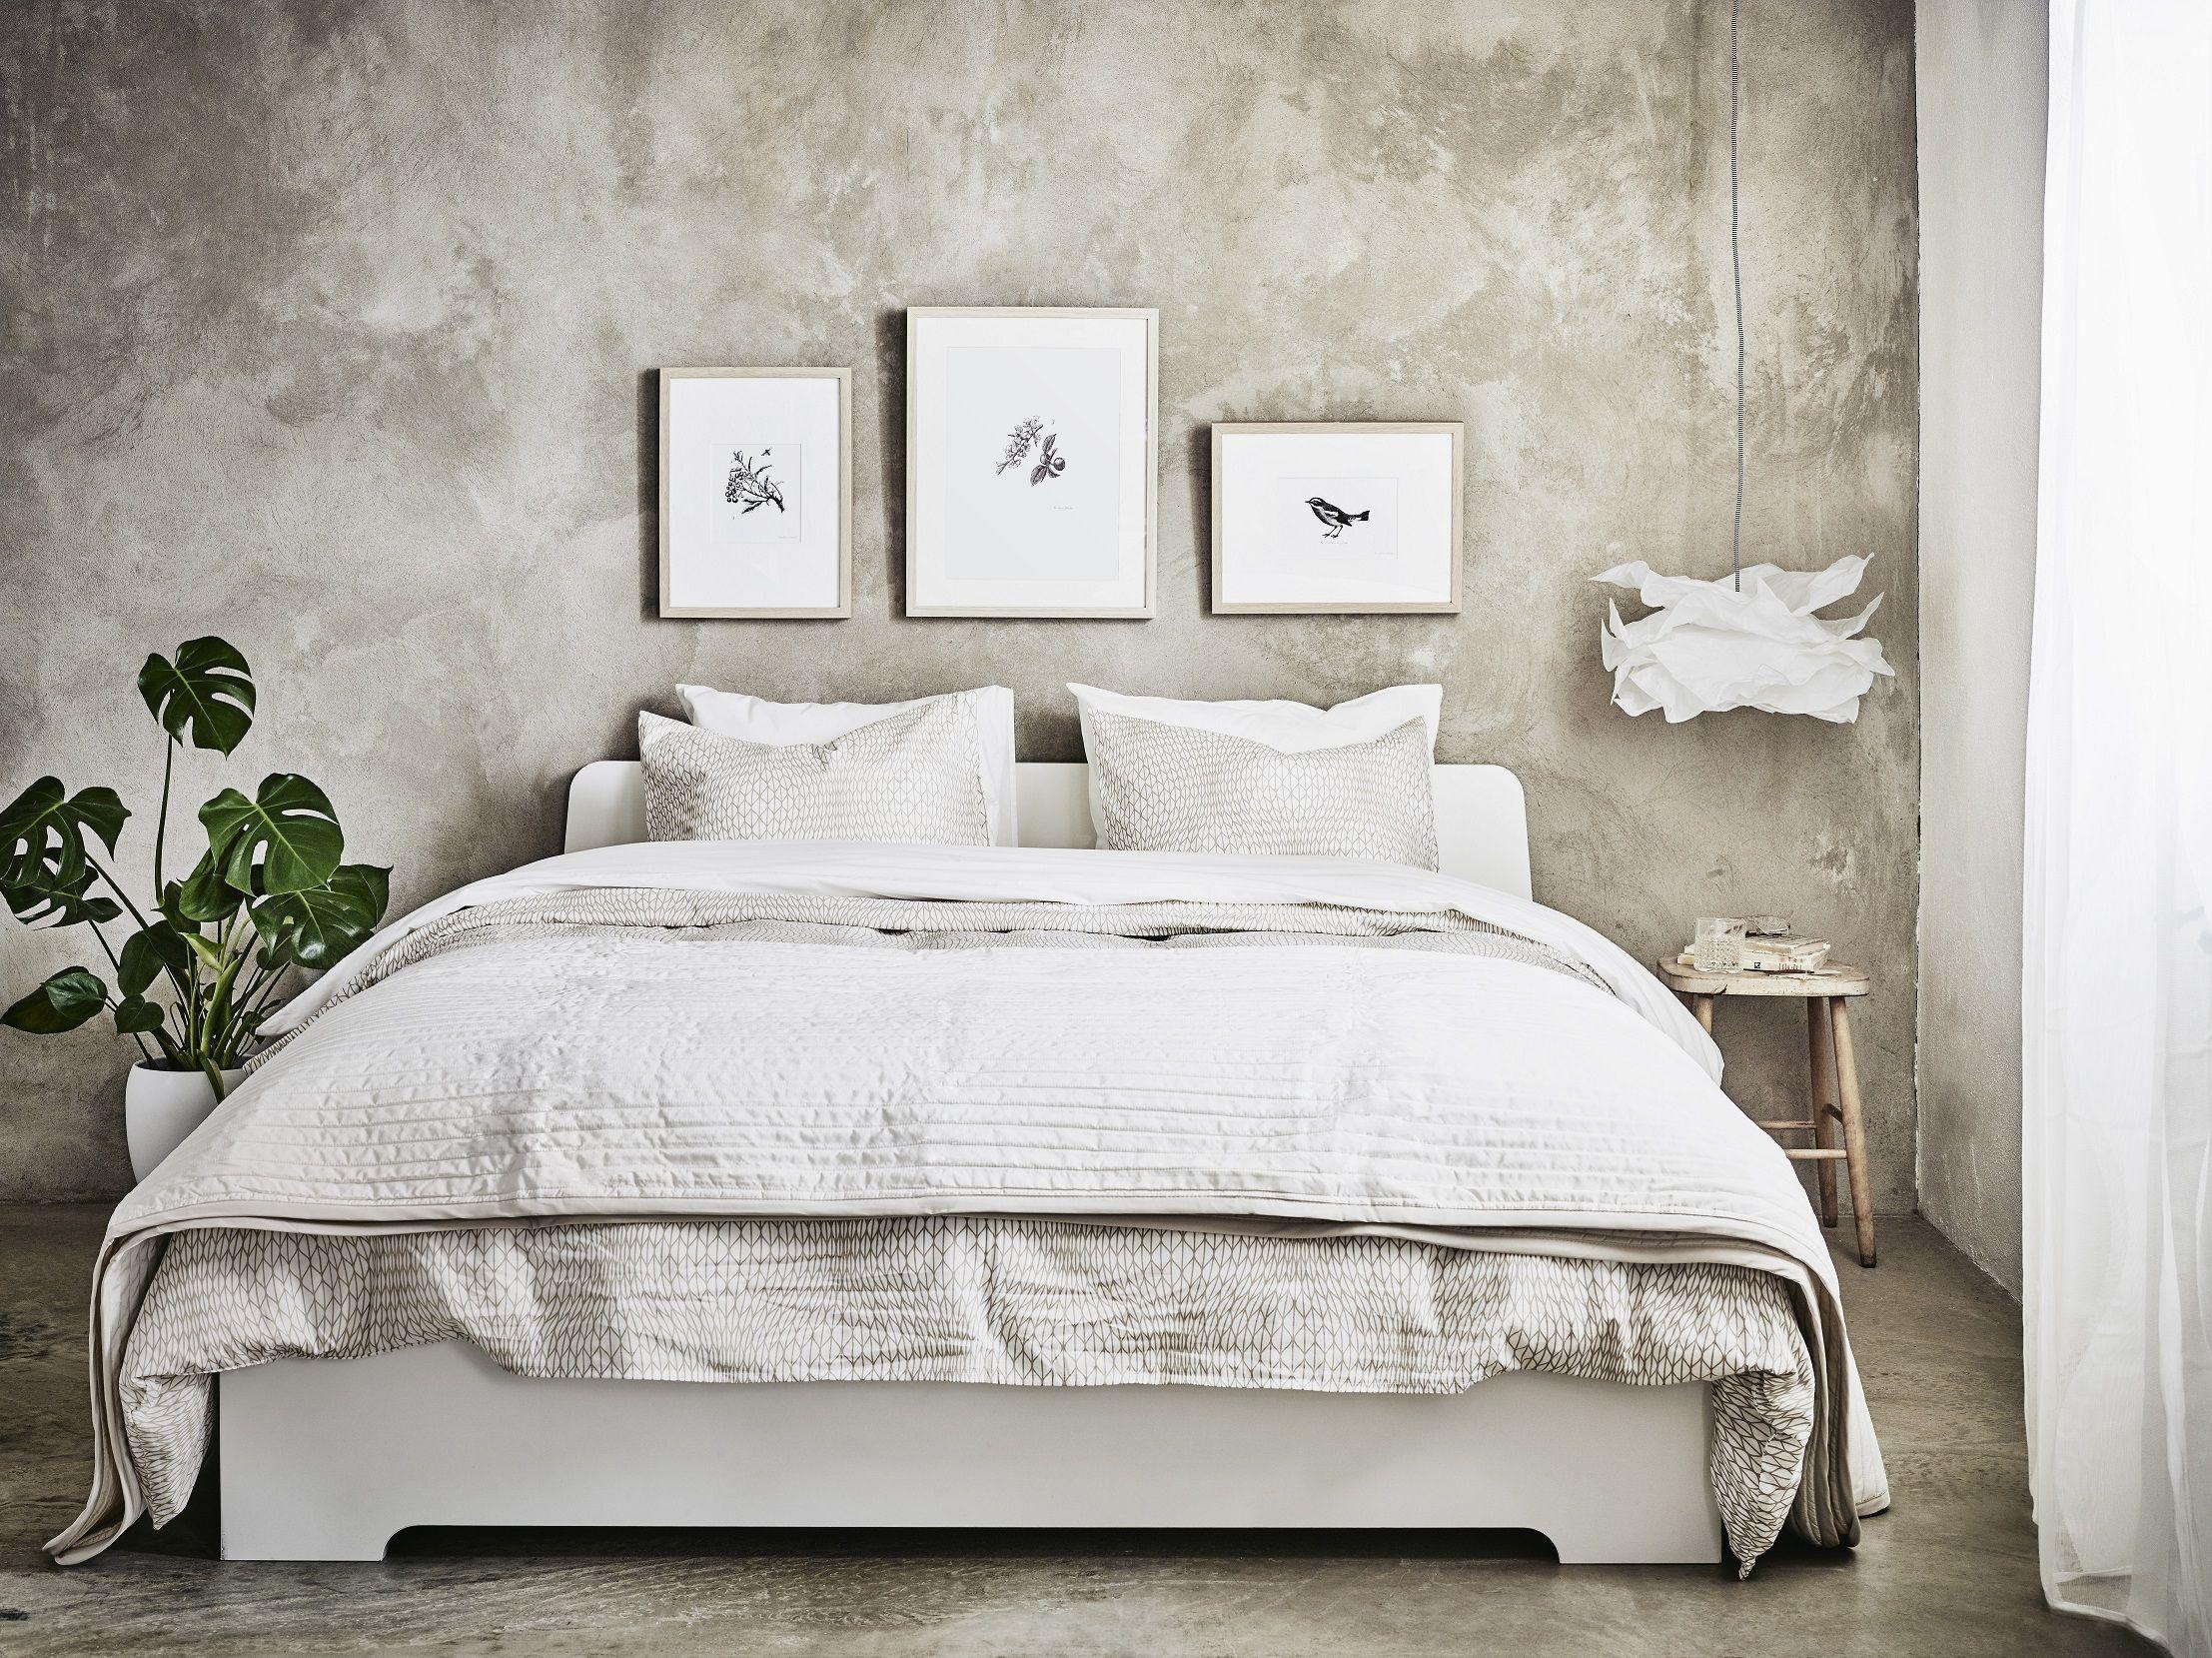 Pocketvering matras beste koop beste koop matras ikea